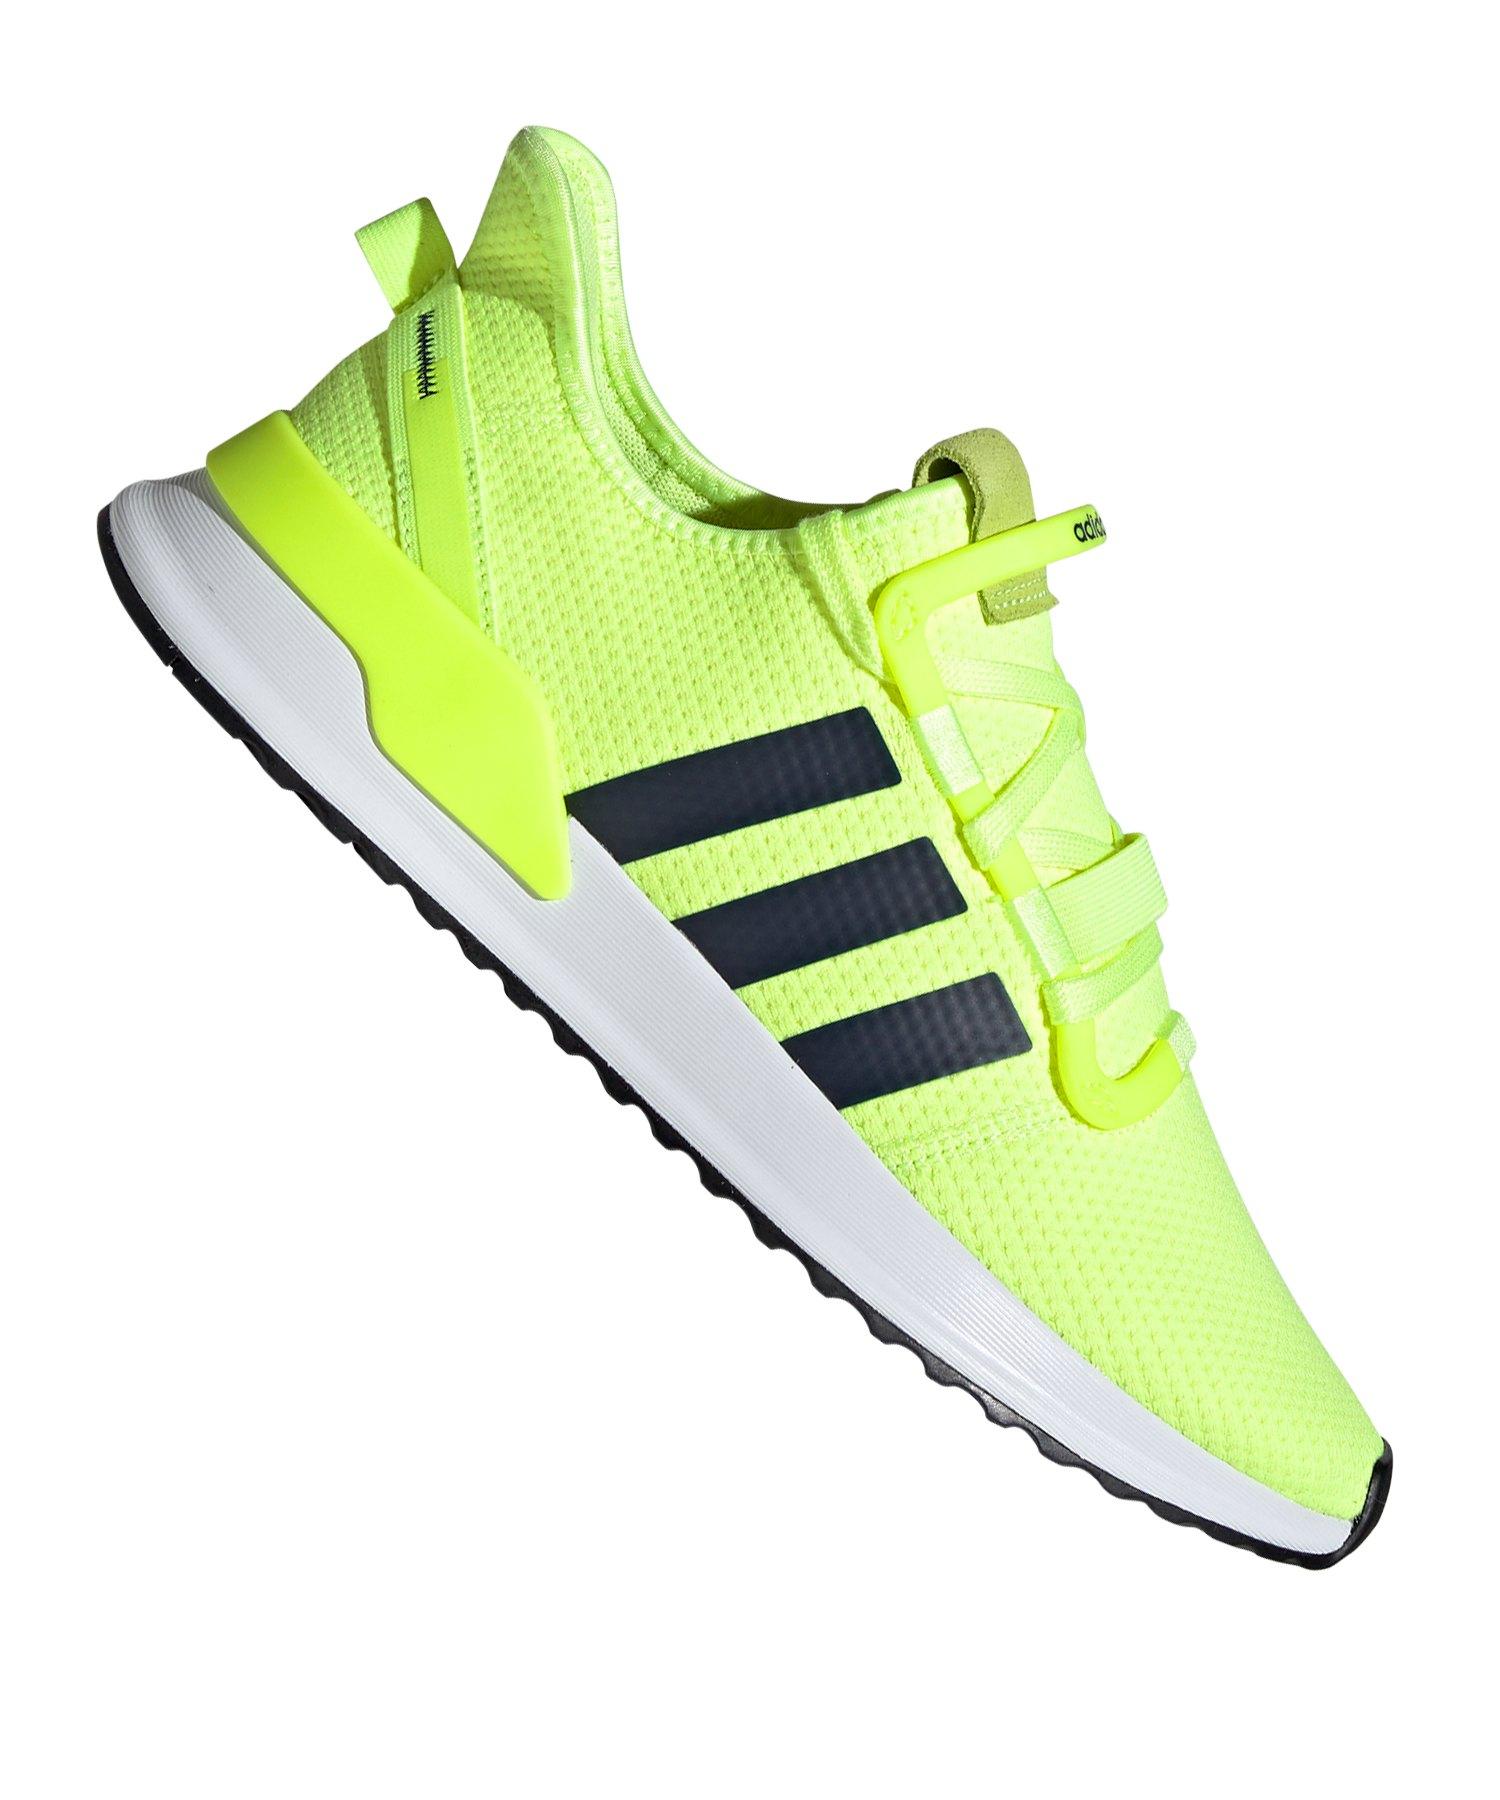 adidas yeezy boost 350 neon gelb